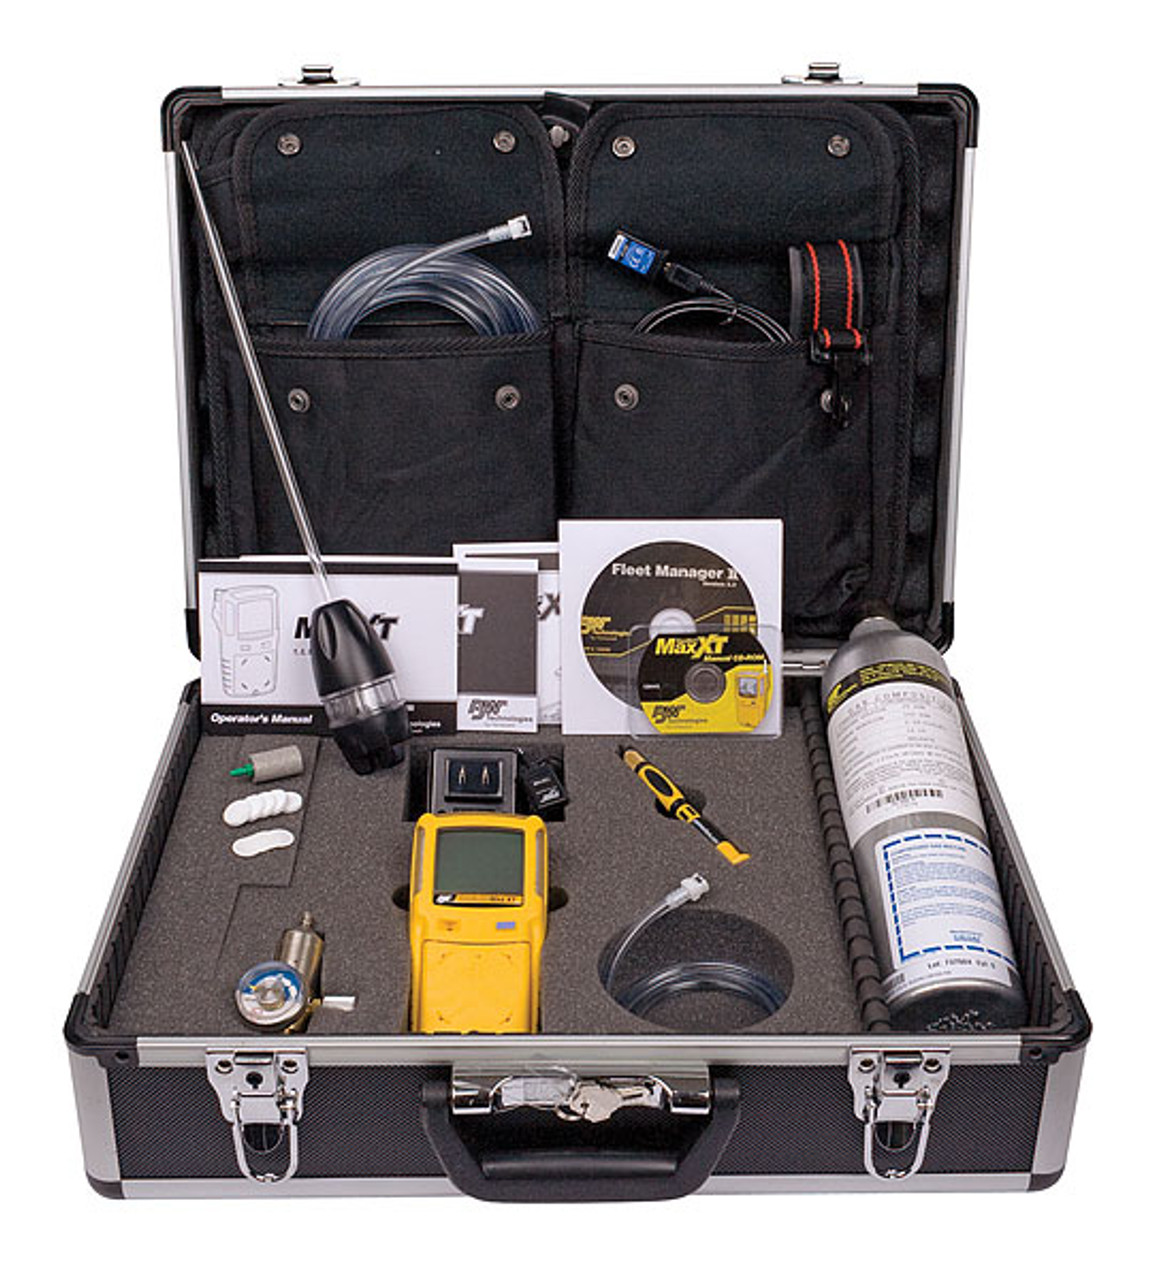 GasAlertMax XT II - Confined Space Kit